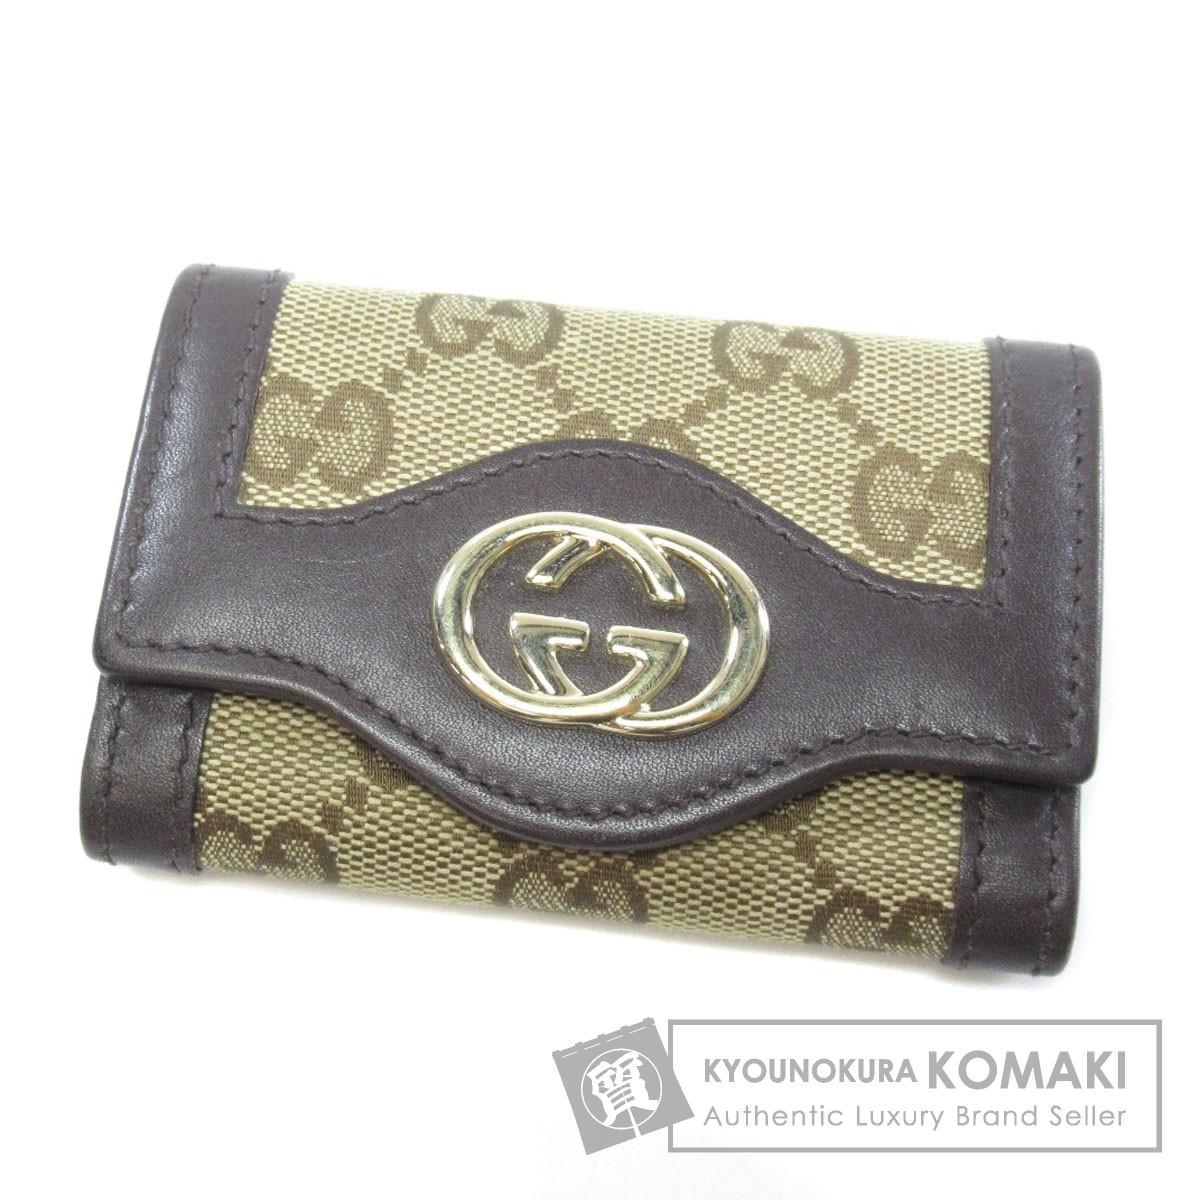 9d011414db33 Kyonokura Komaki Brand Cheapest Challenger: Authentic GUCCI 282432 ...